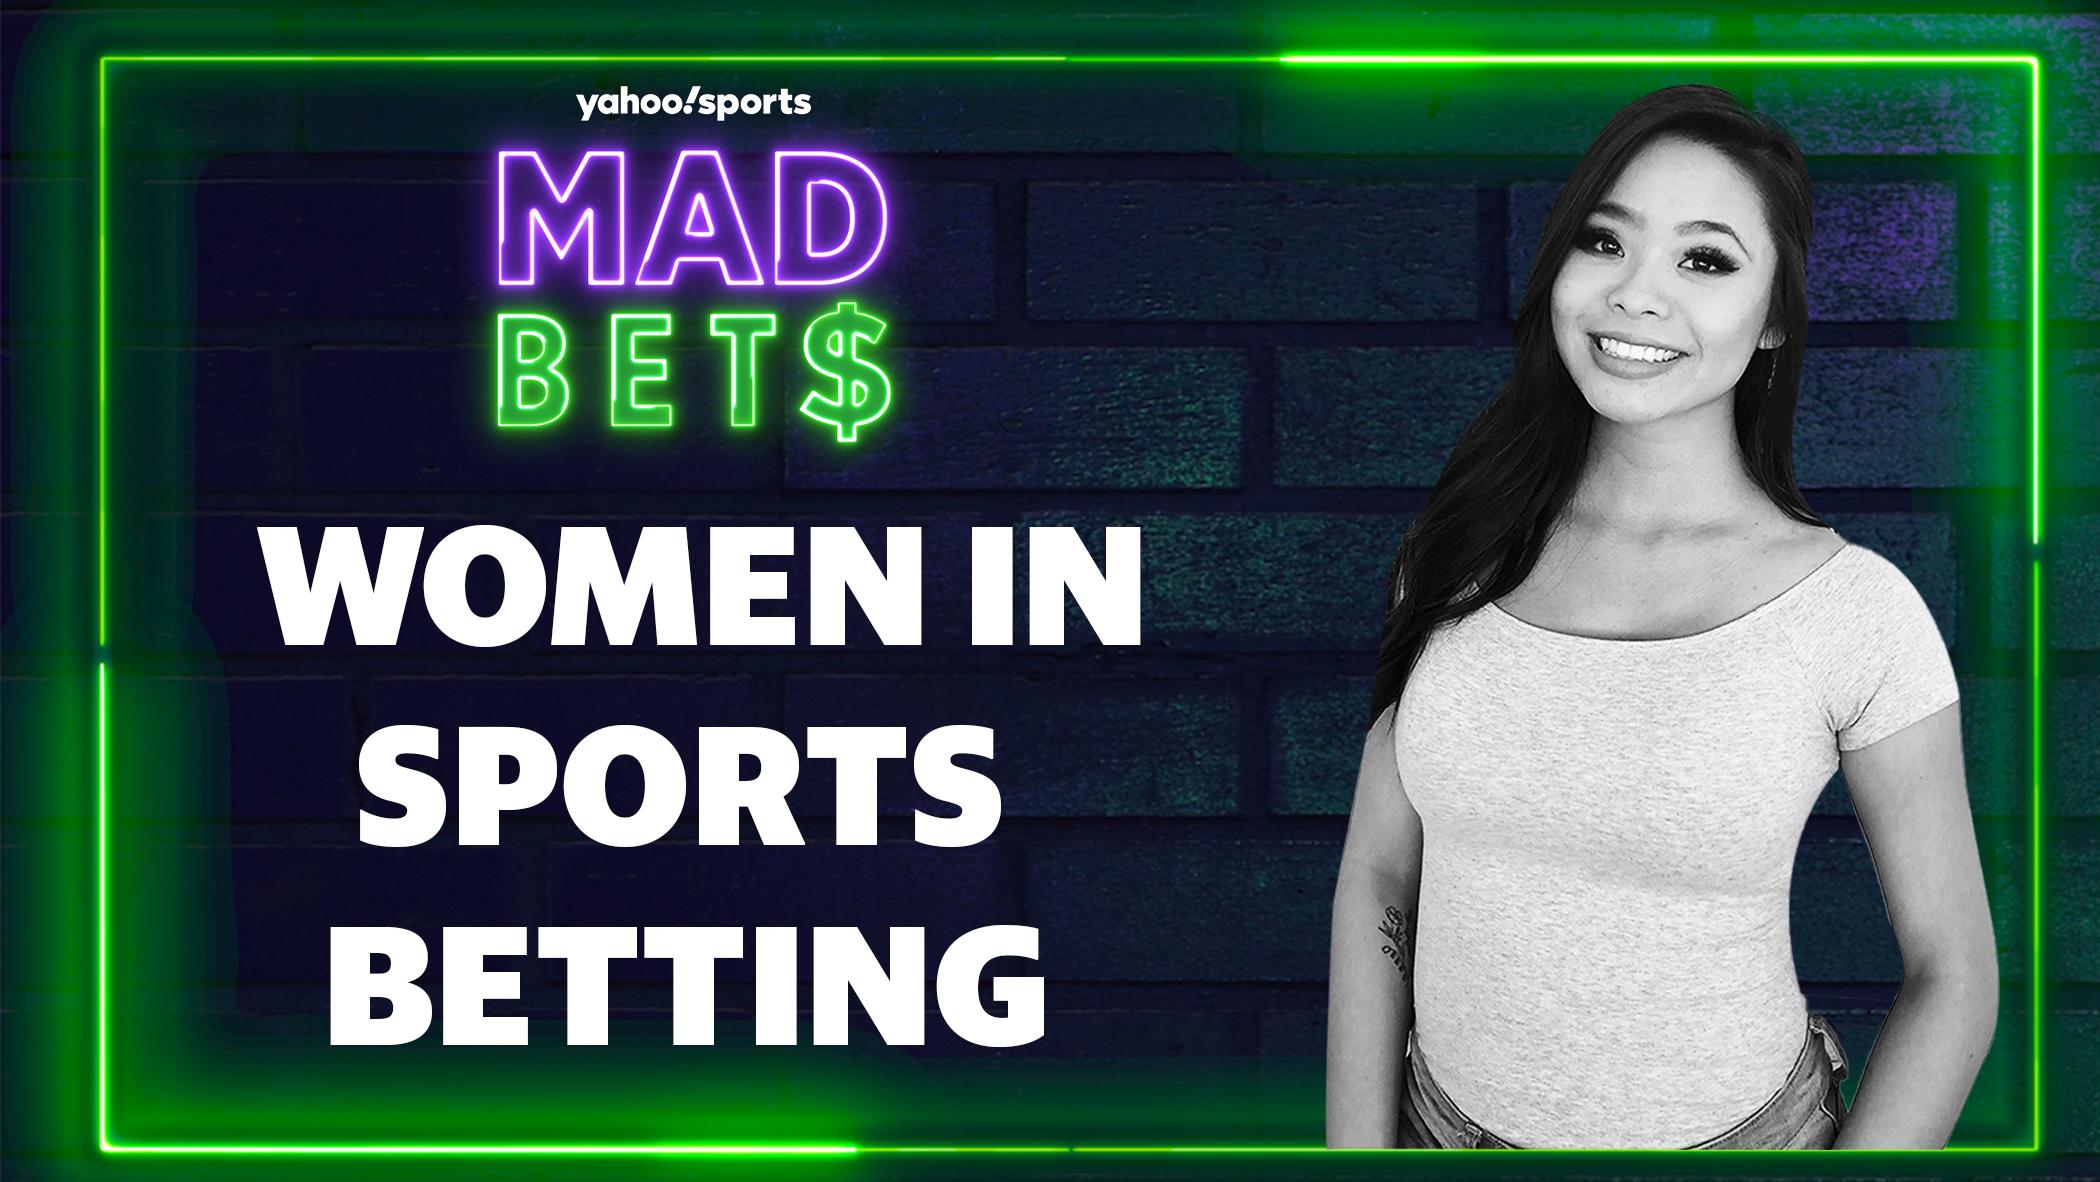 Yahoo round by round boxing betting bet big on marijuana